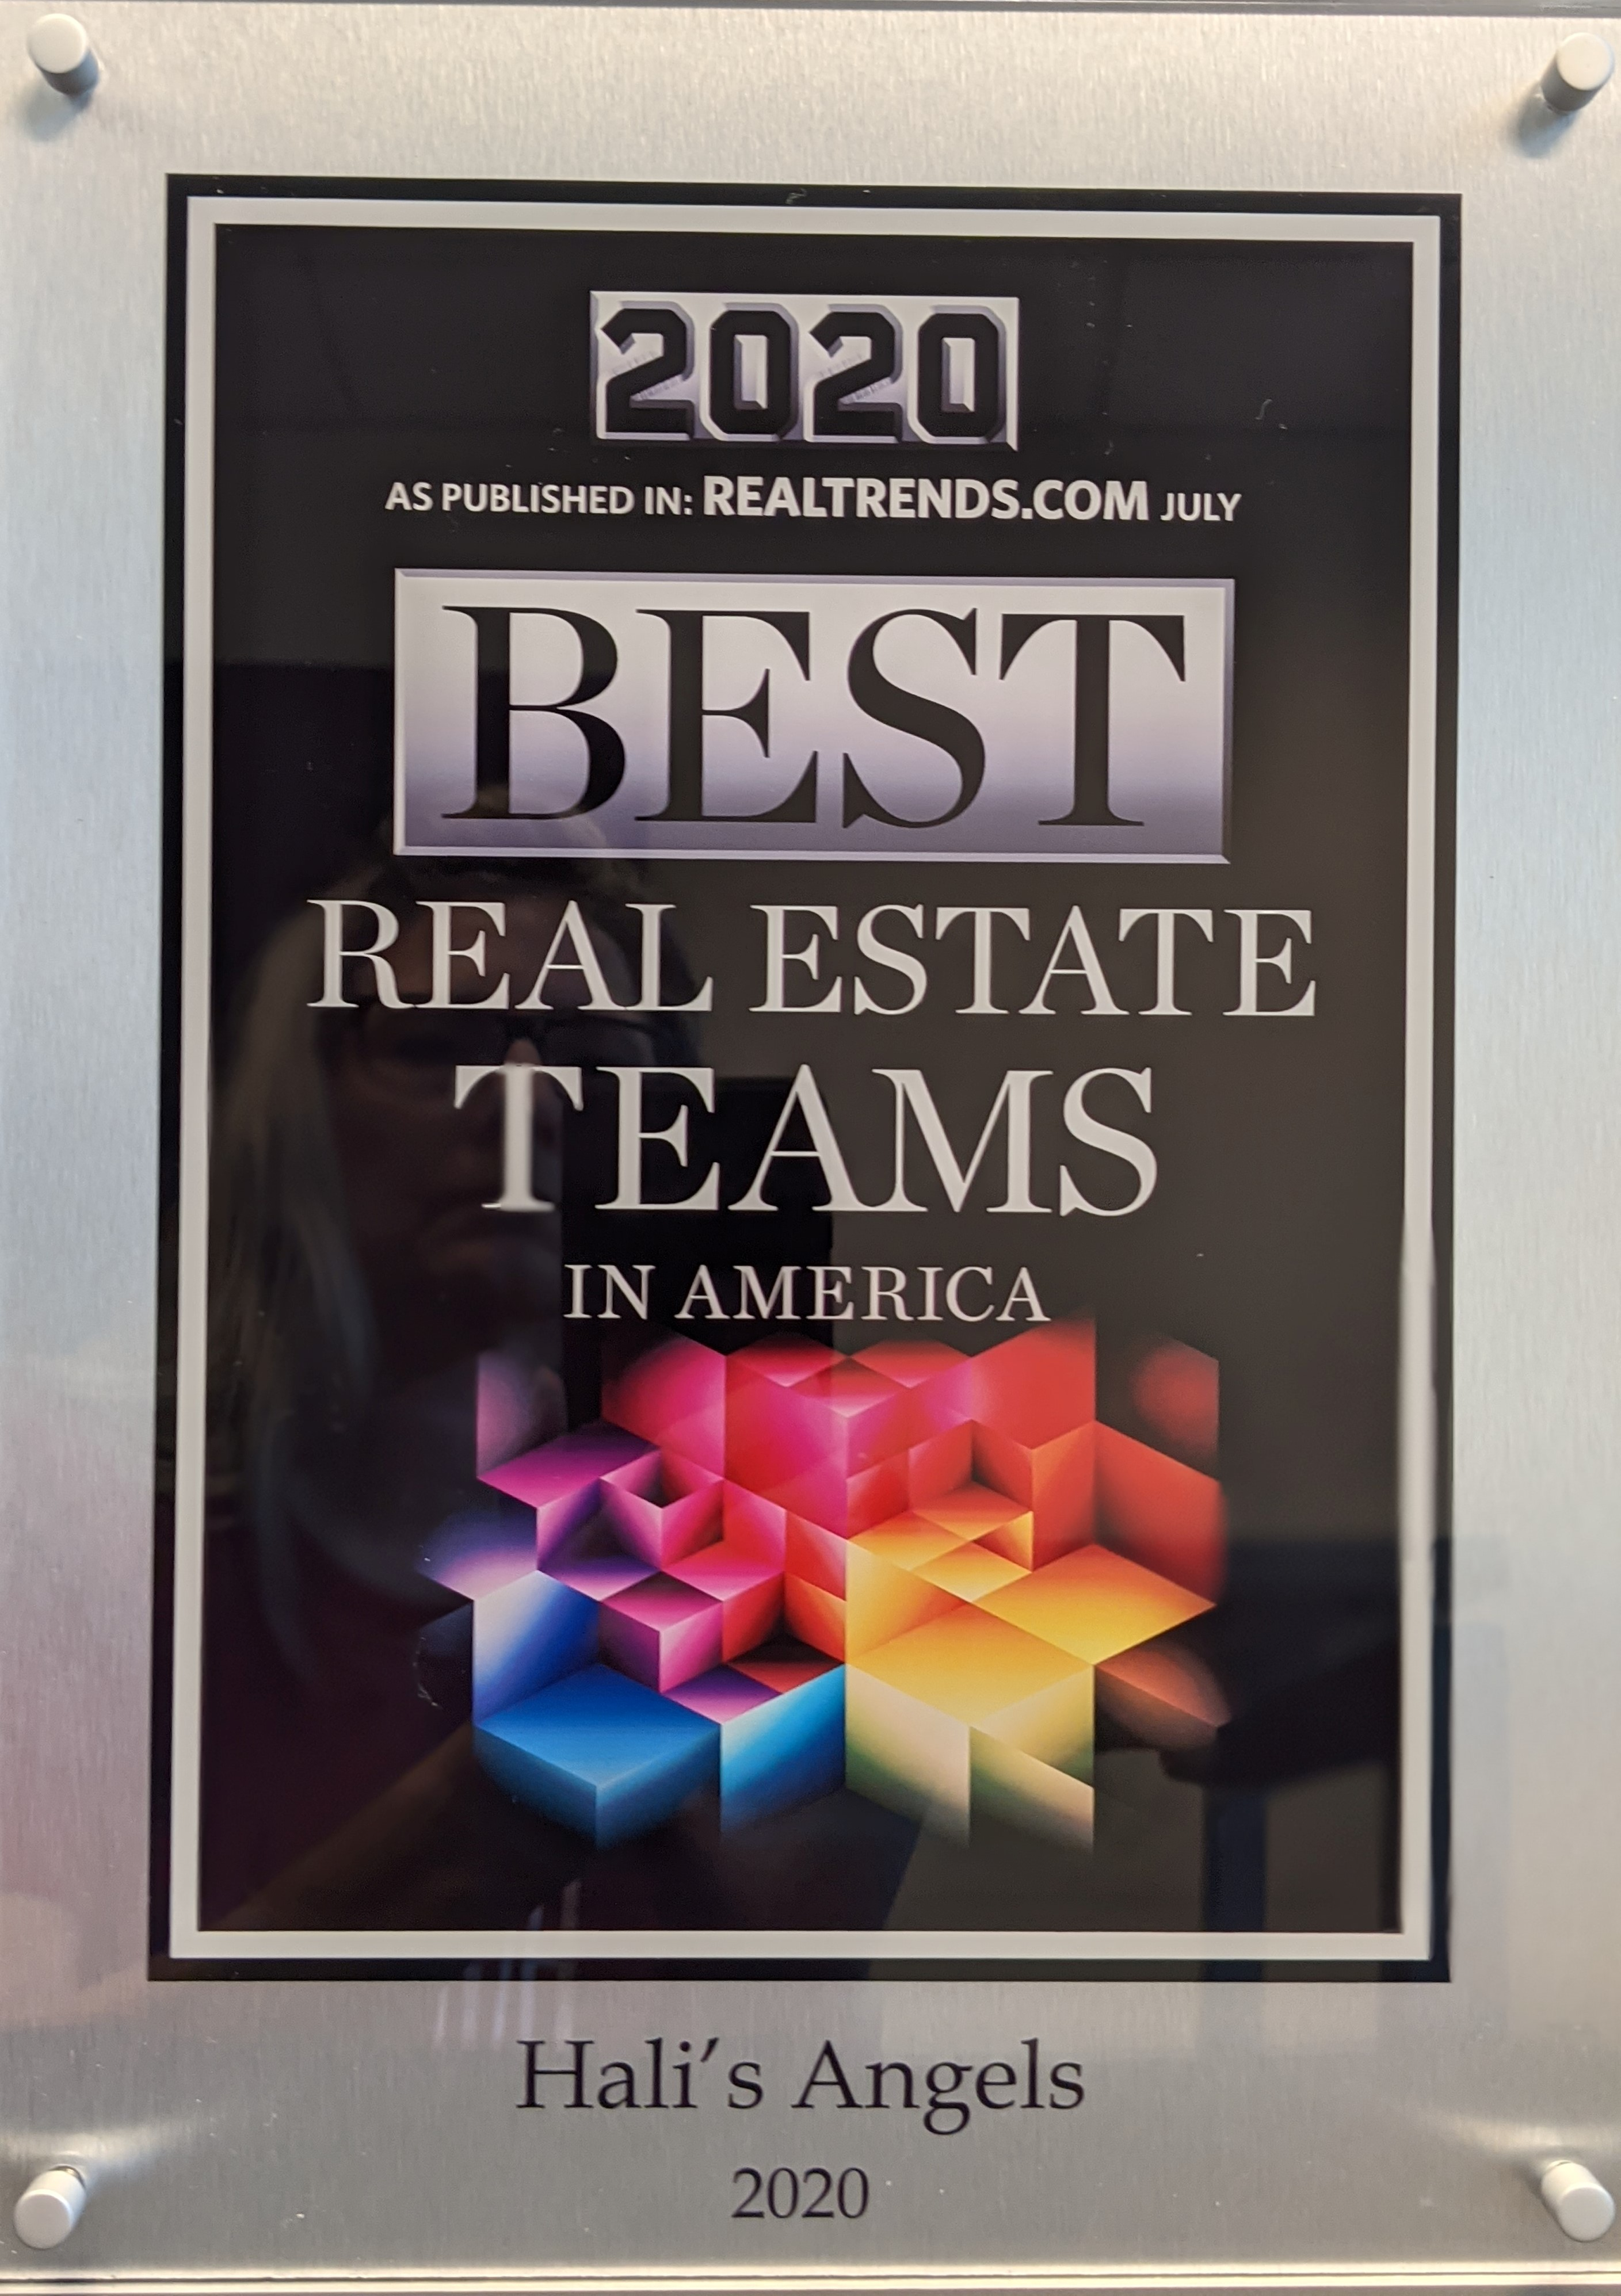 Hali's Angels Top Real Estate Teams 2020